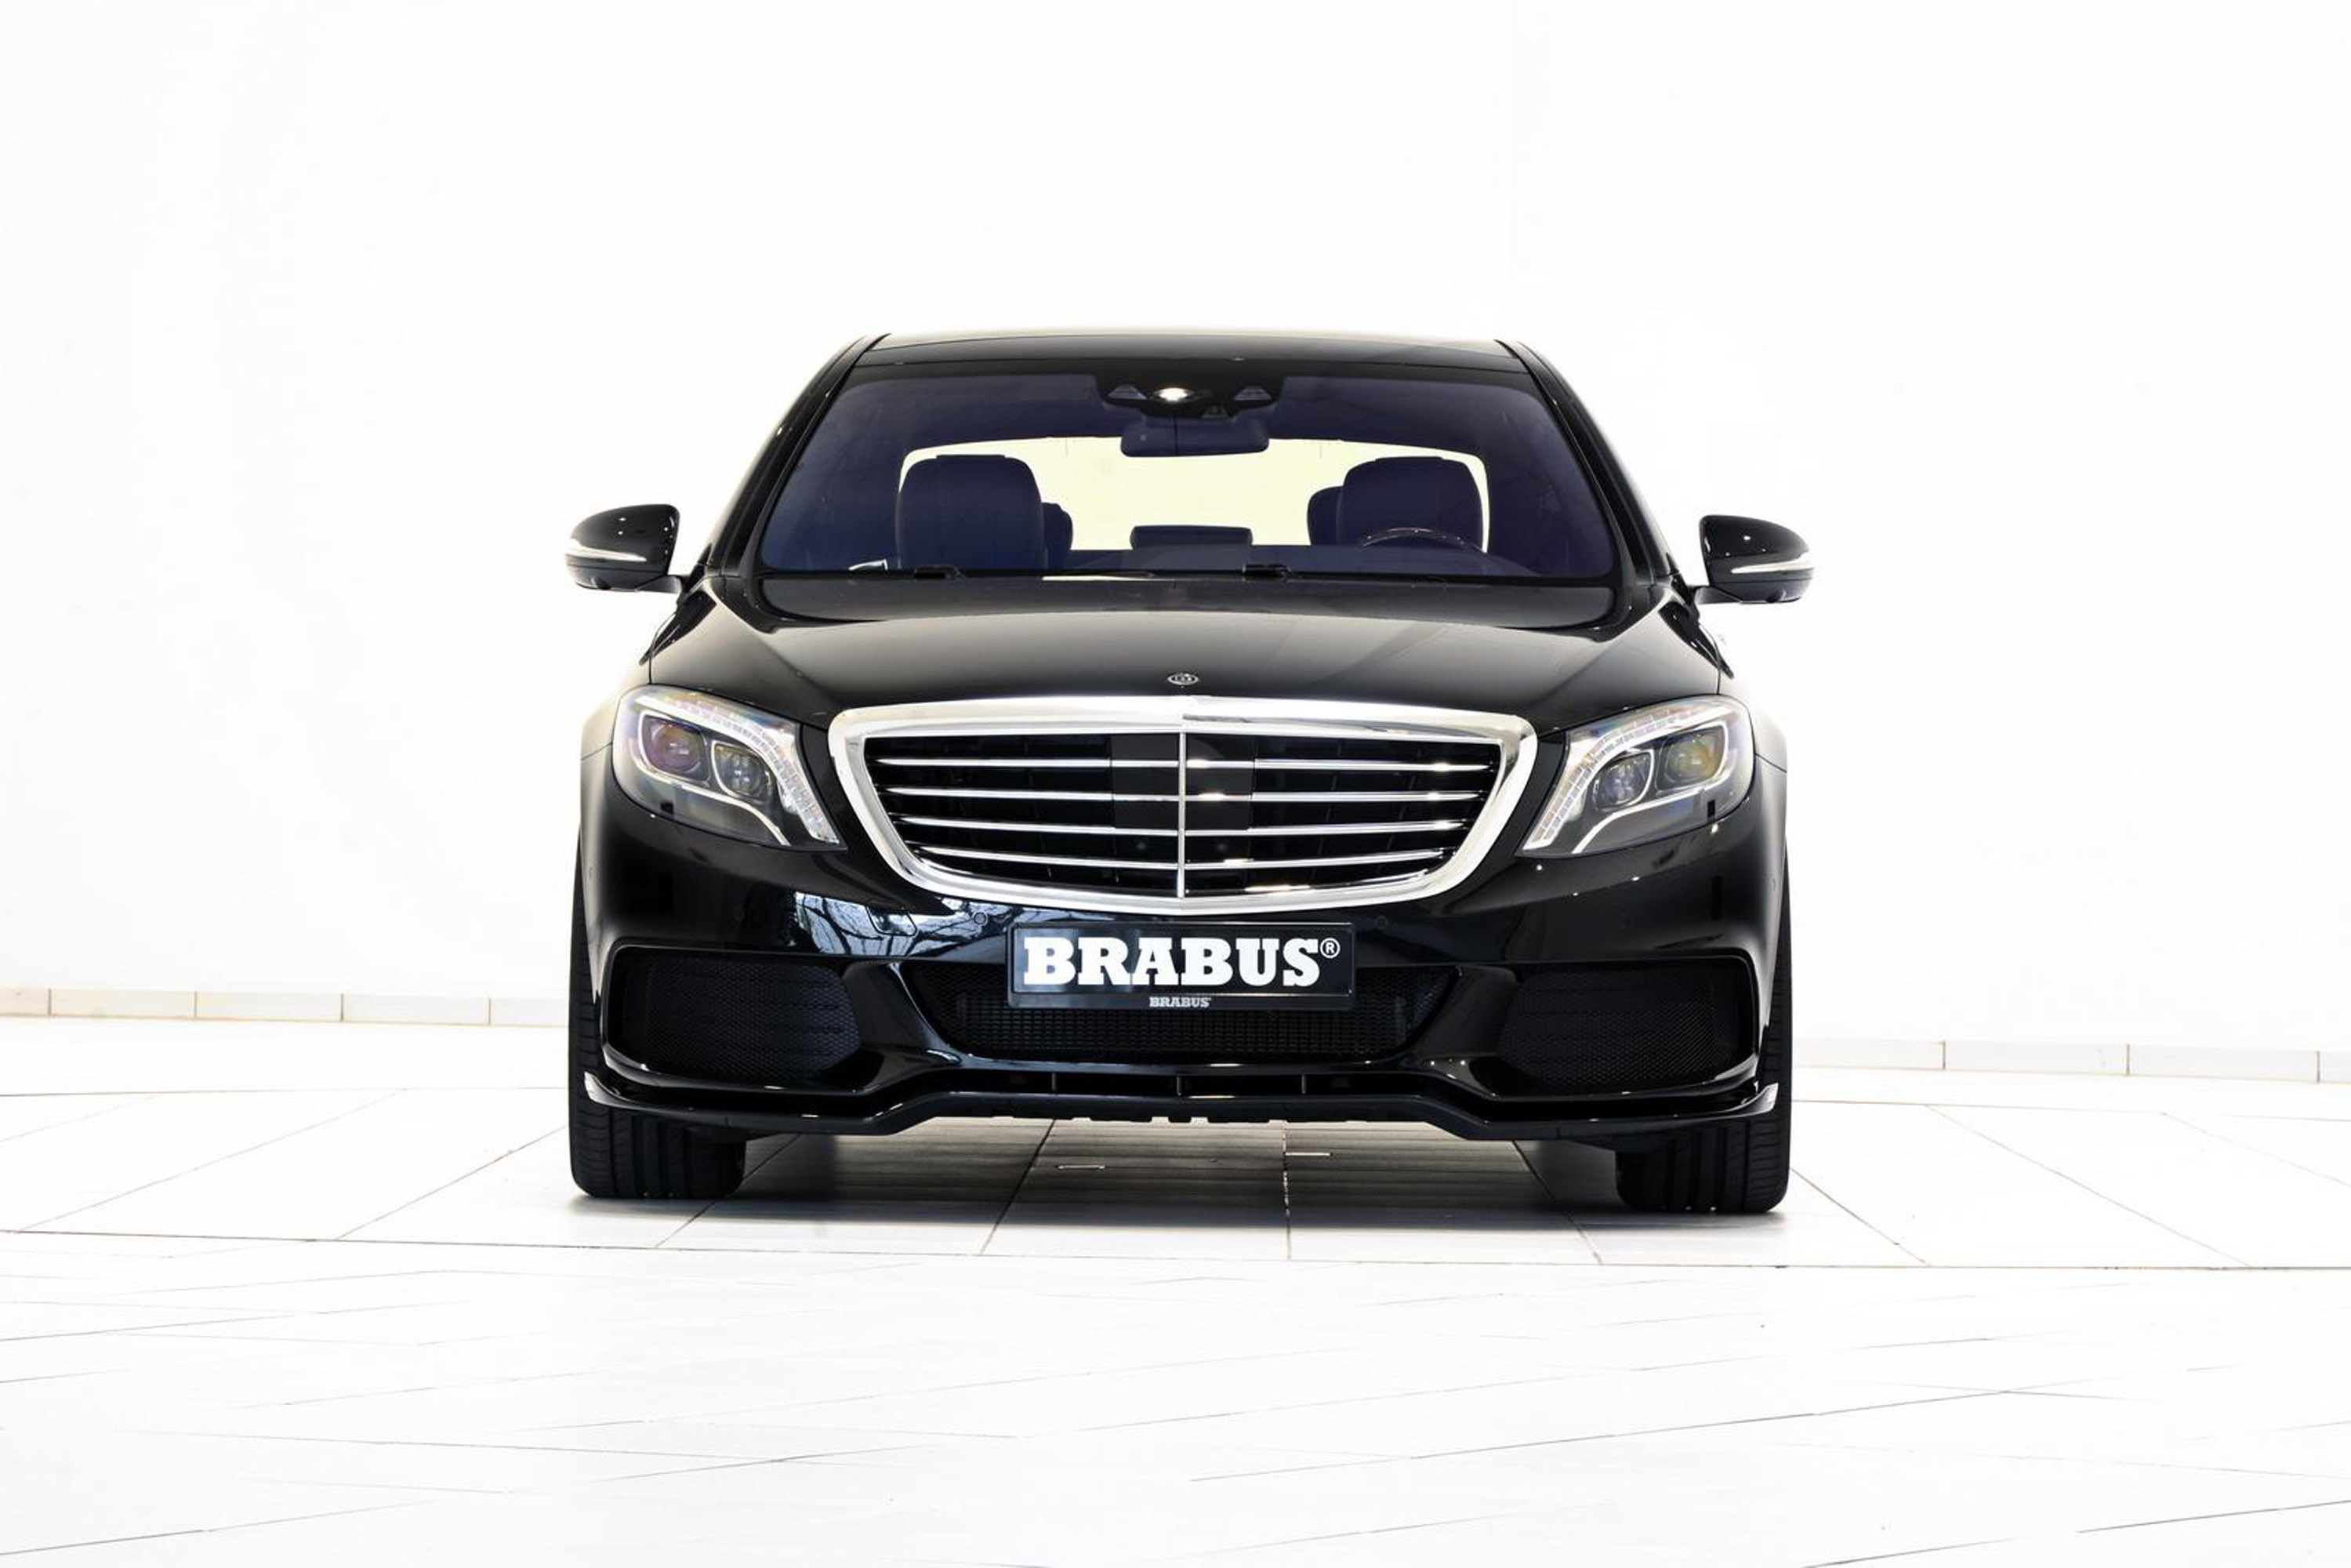 2015 brabus mercedes benz s500 plug in hybrid picture 121846. Black Bedroom Furniture Sets. Home Design Ideas